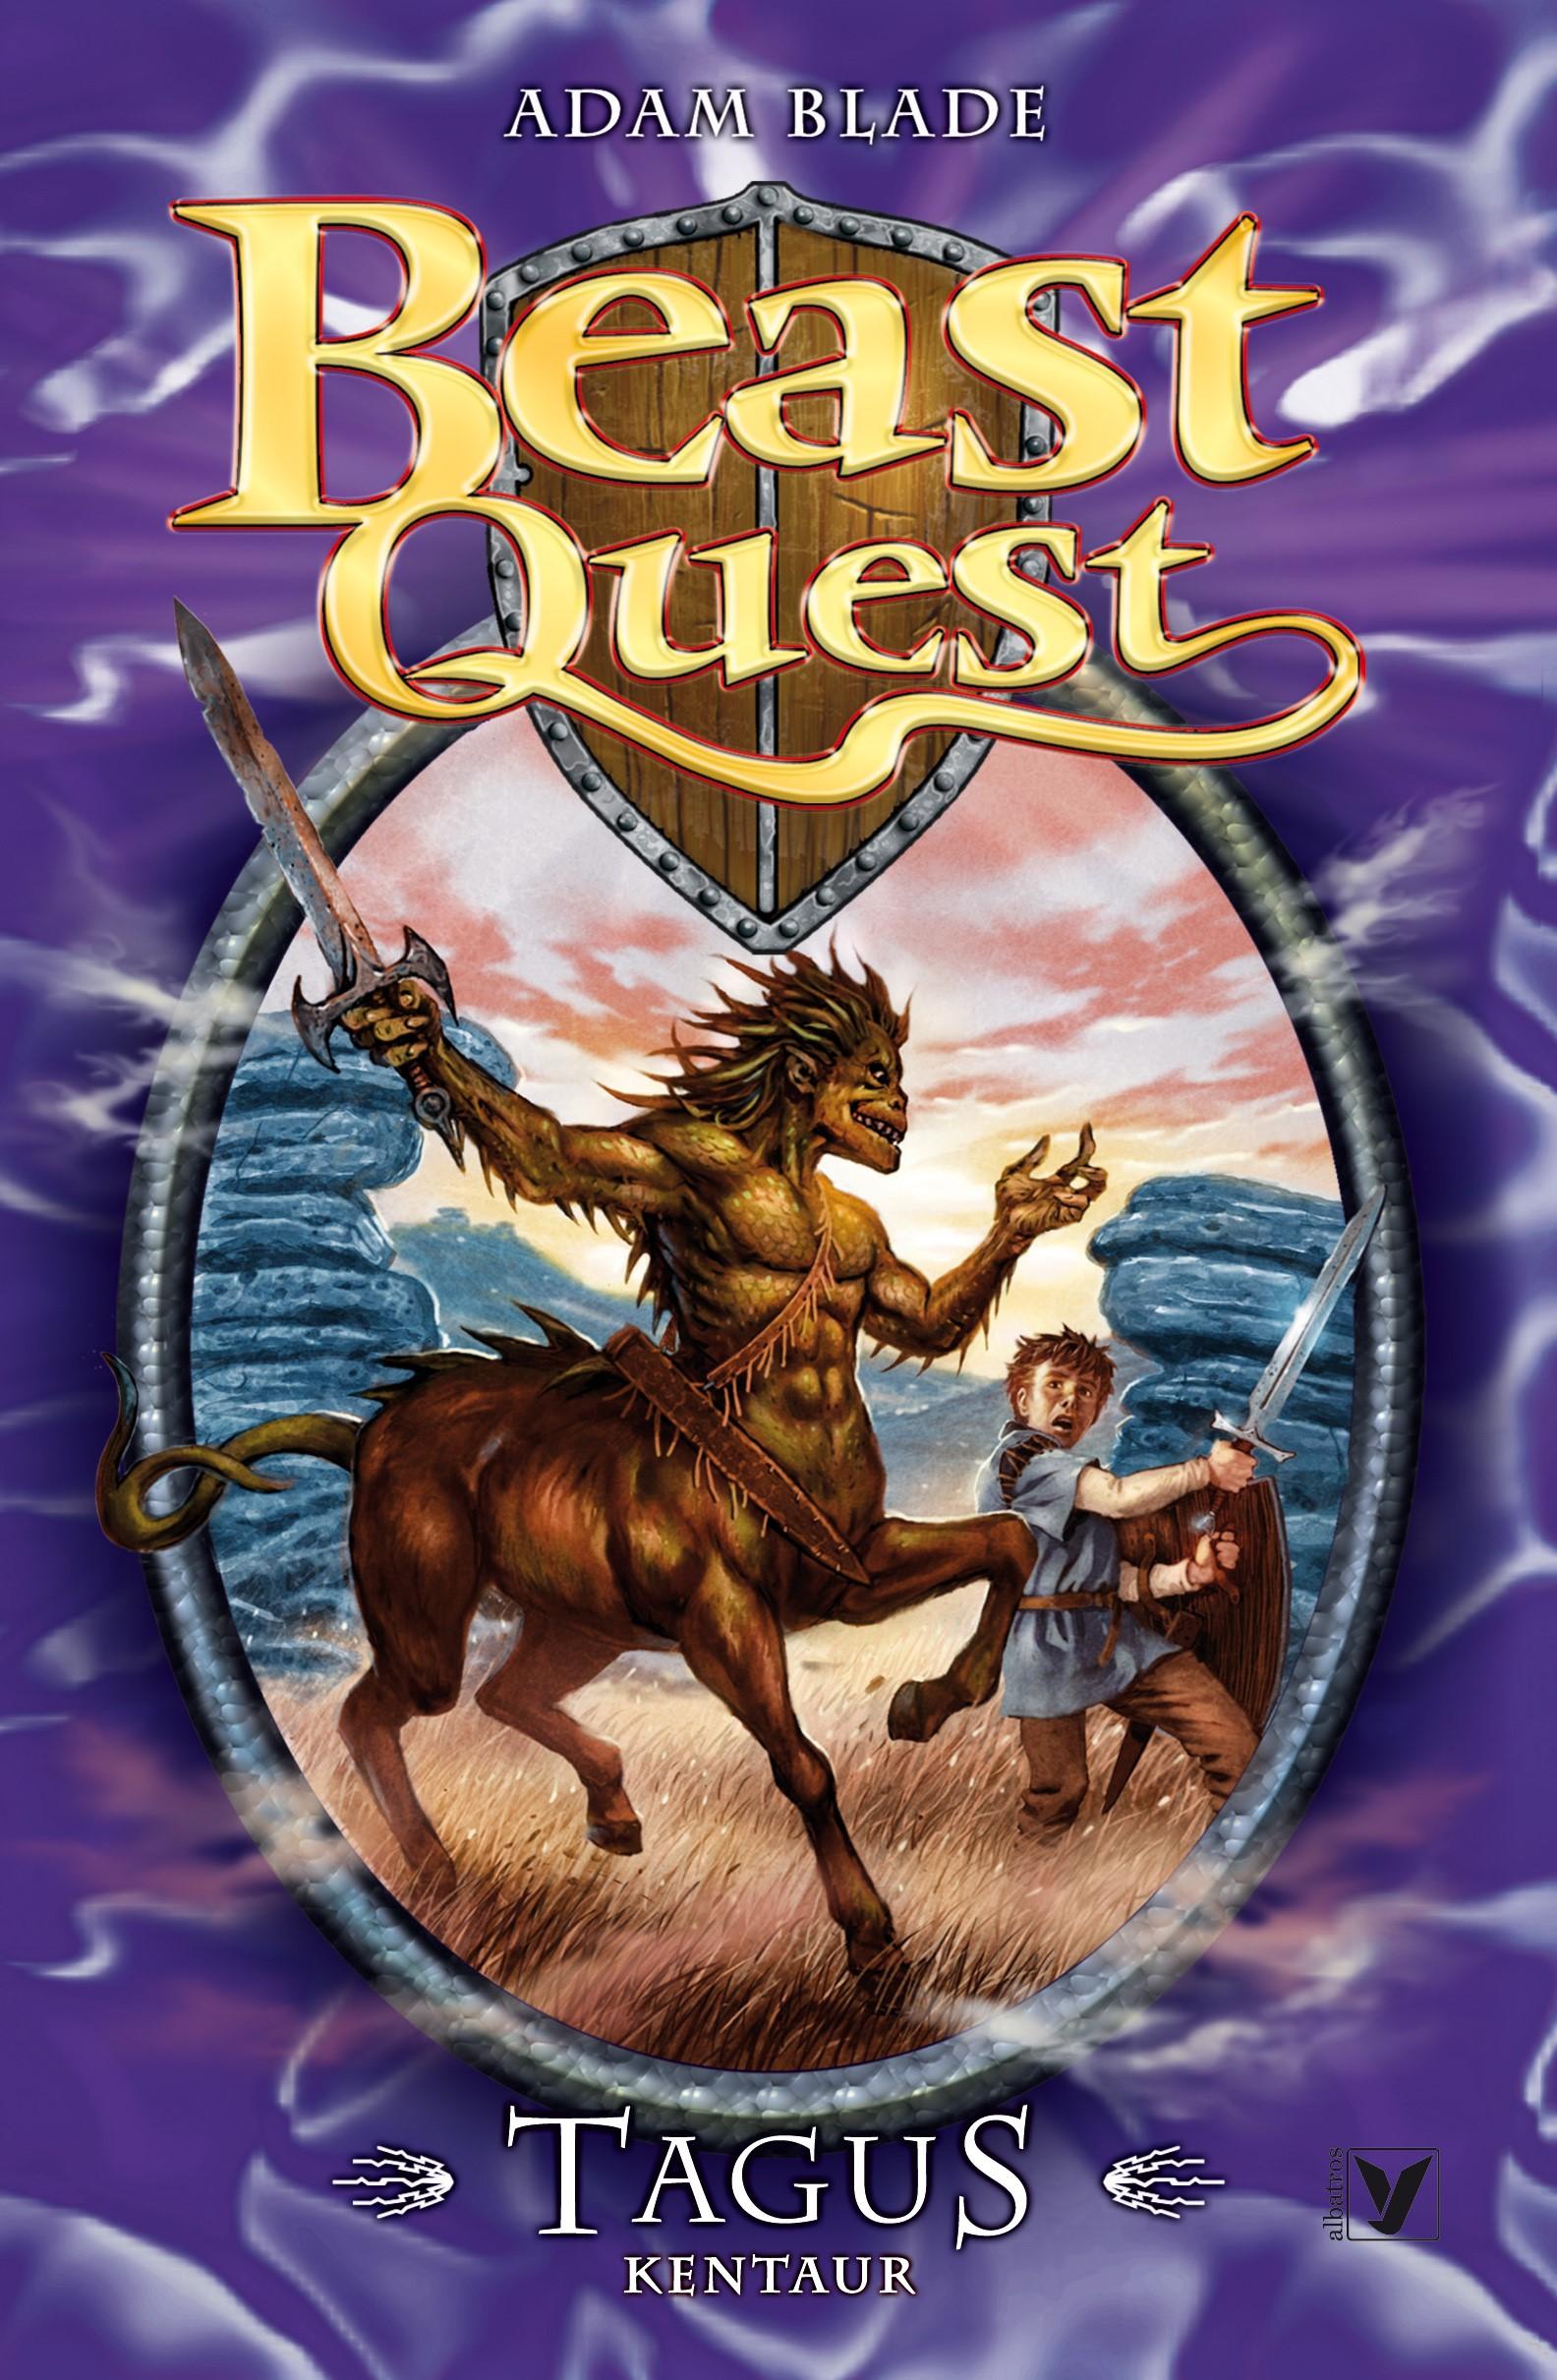 Book Cover Craft Quest ~ Tagus kentaur beast quest albatrosmedia cz